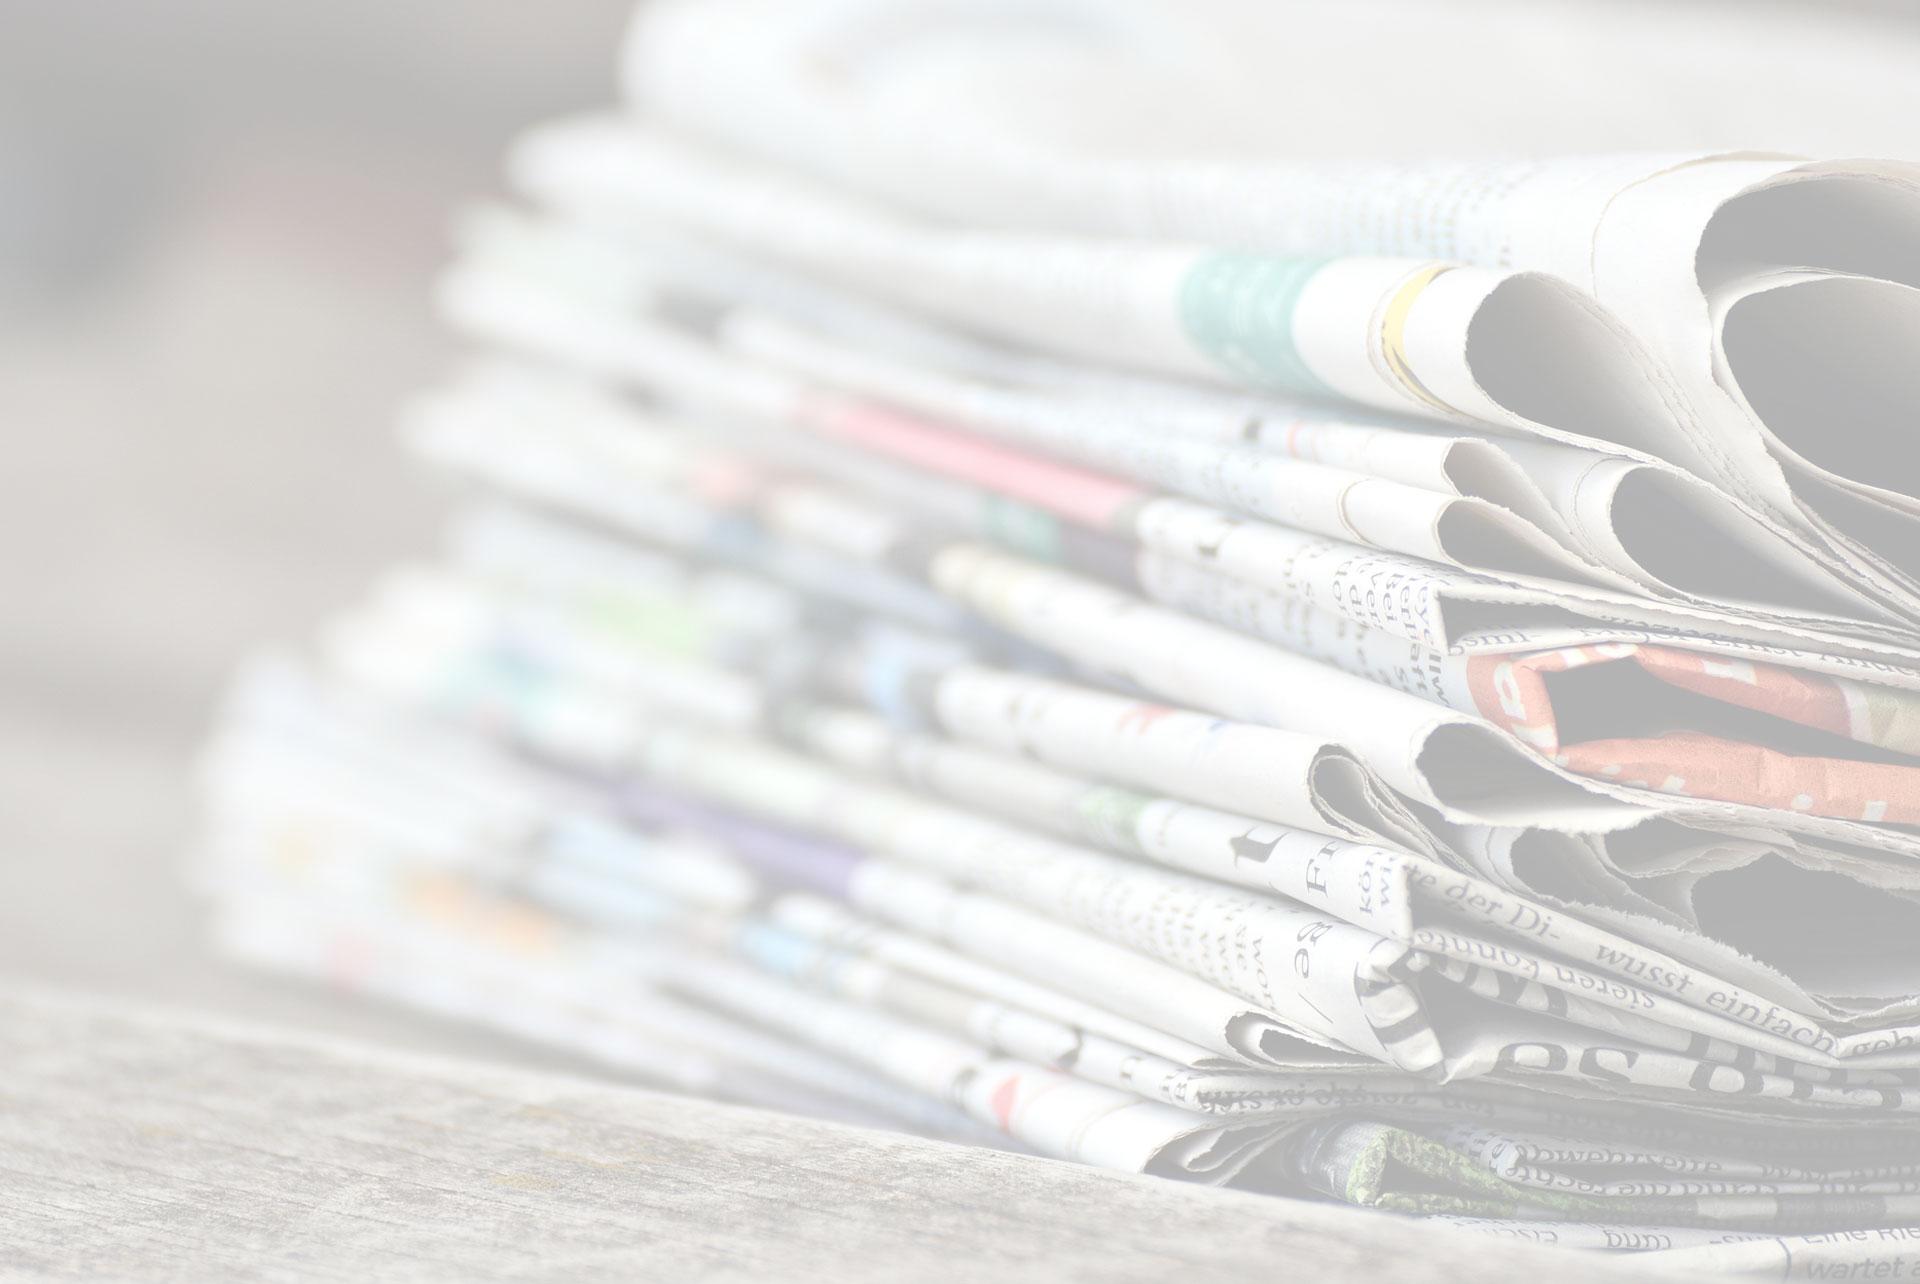 Leonardo Everton Sousa Soares Stefano Sensi José Machin Christian Kouamé Piatek Deulofeu Mercato Milan